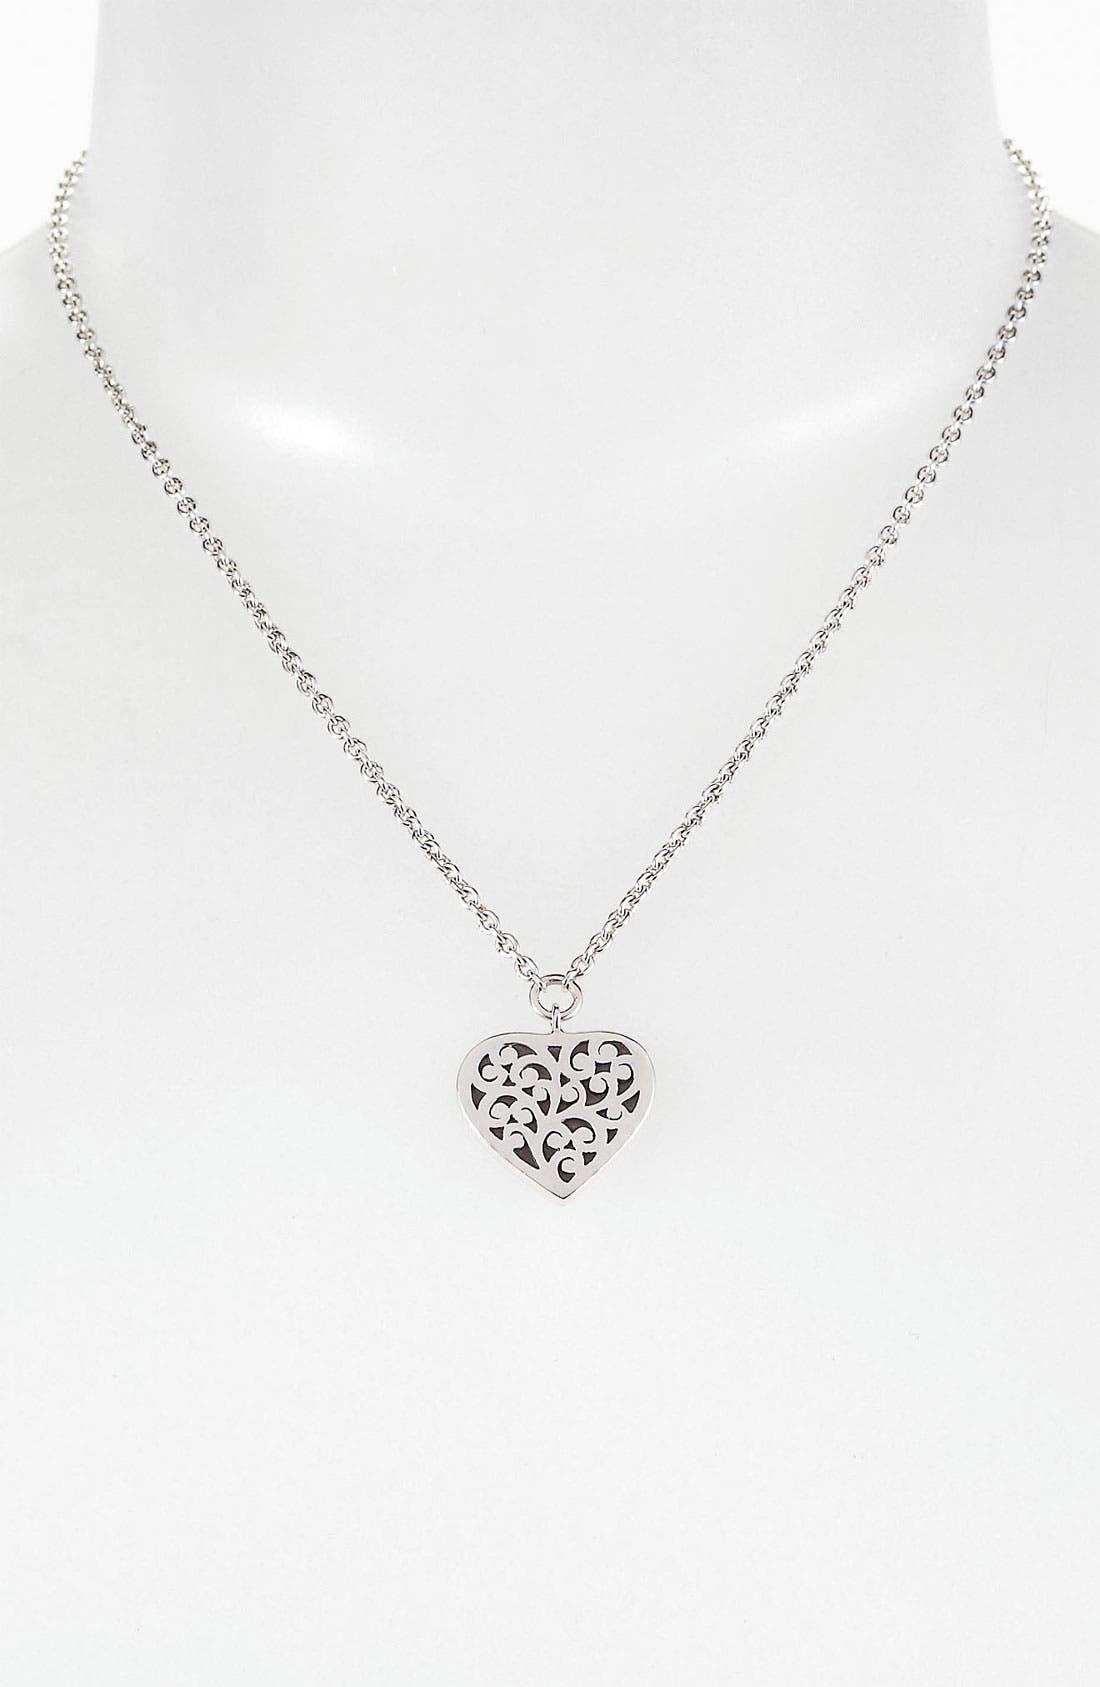 Main Image - Lois Hill Heart Pendant Necklace